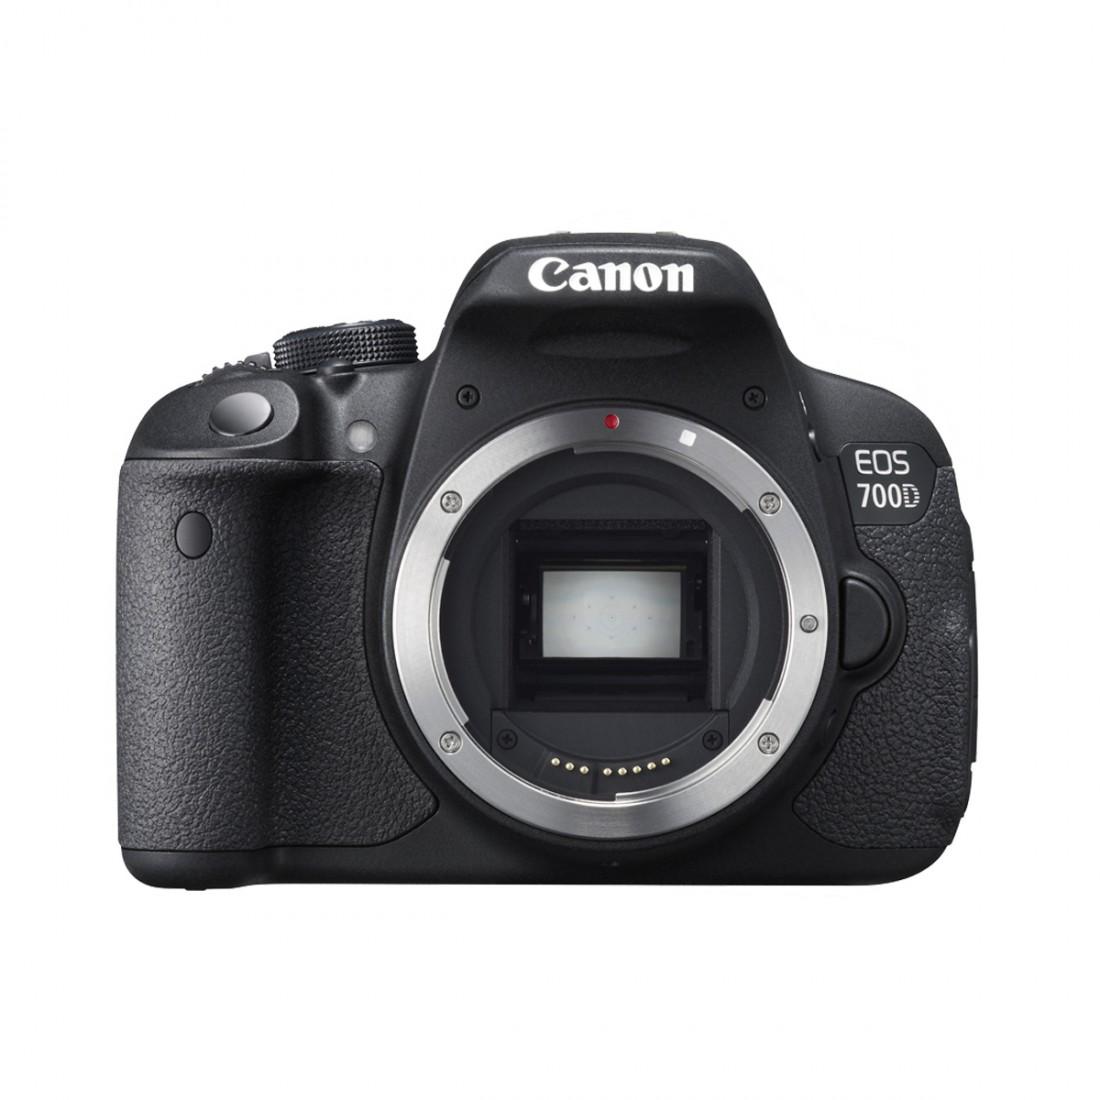 دوربین دیجیتال کانن مدل Canon EOS 800D Digital Camera With 18-55mm IS STM Lens